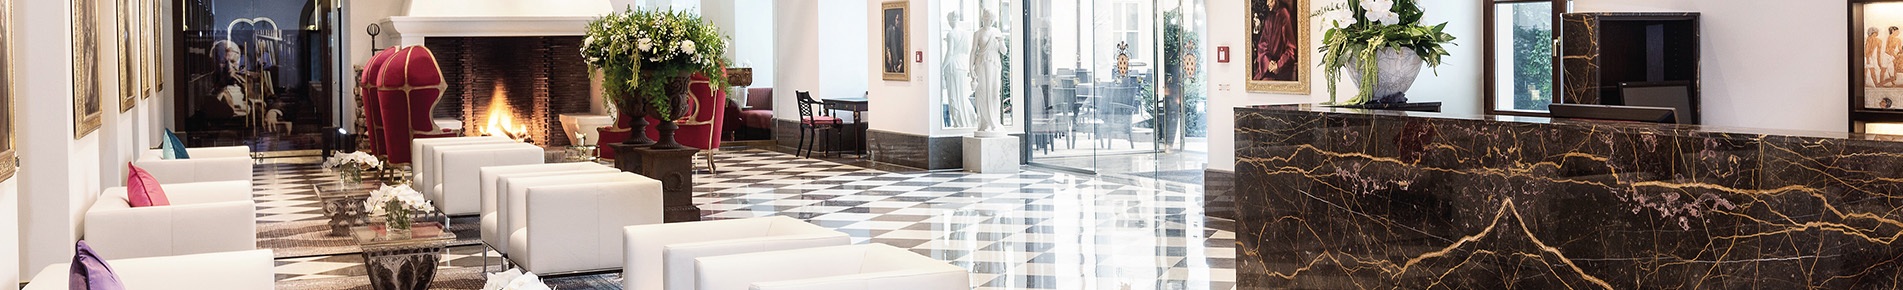 Die elegante Lobby des Living Hotel De Medic